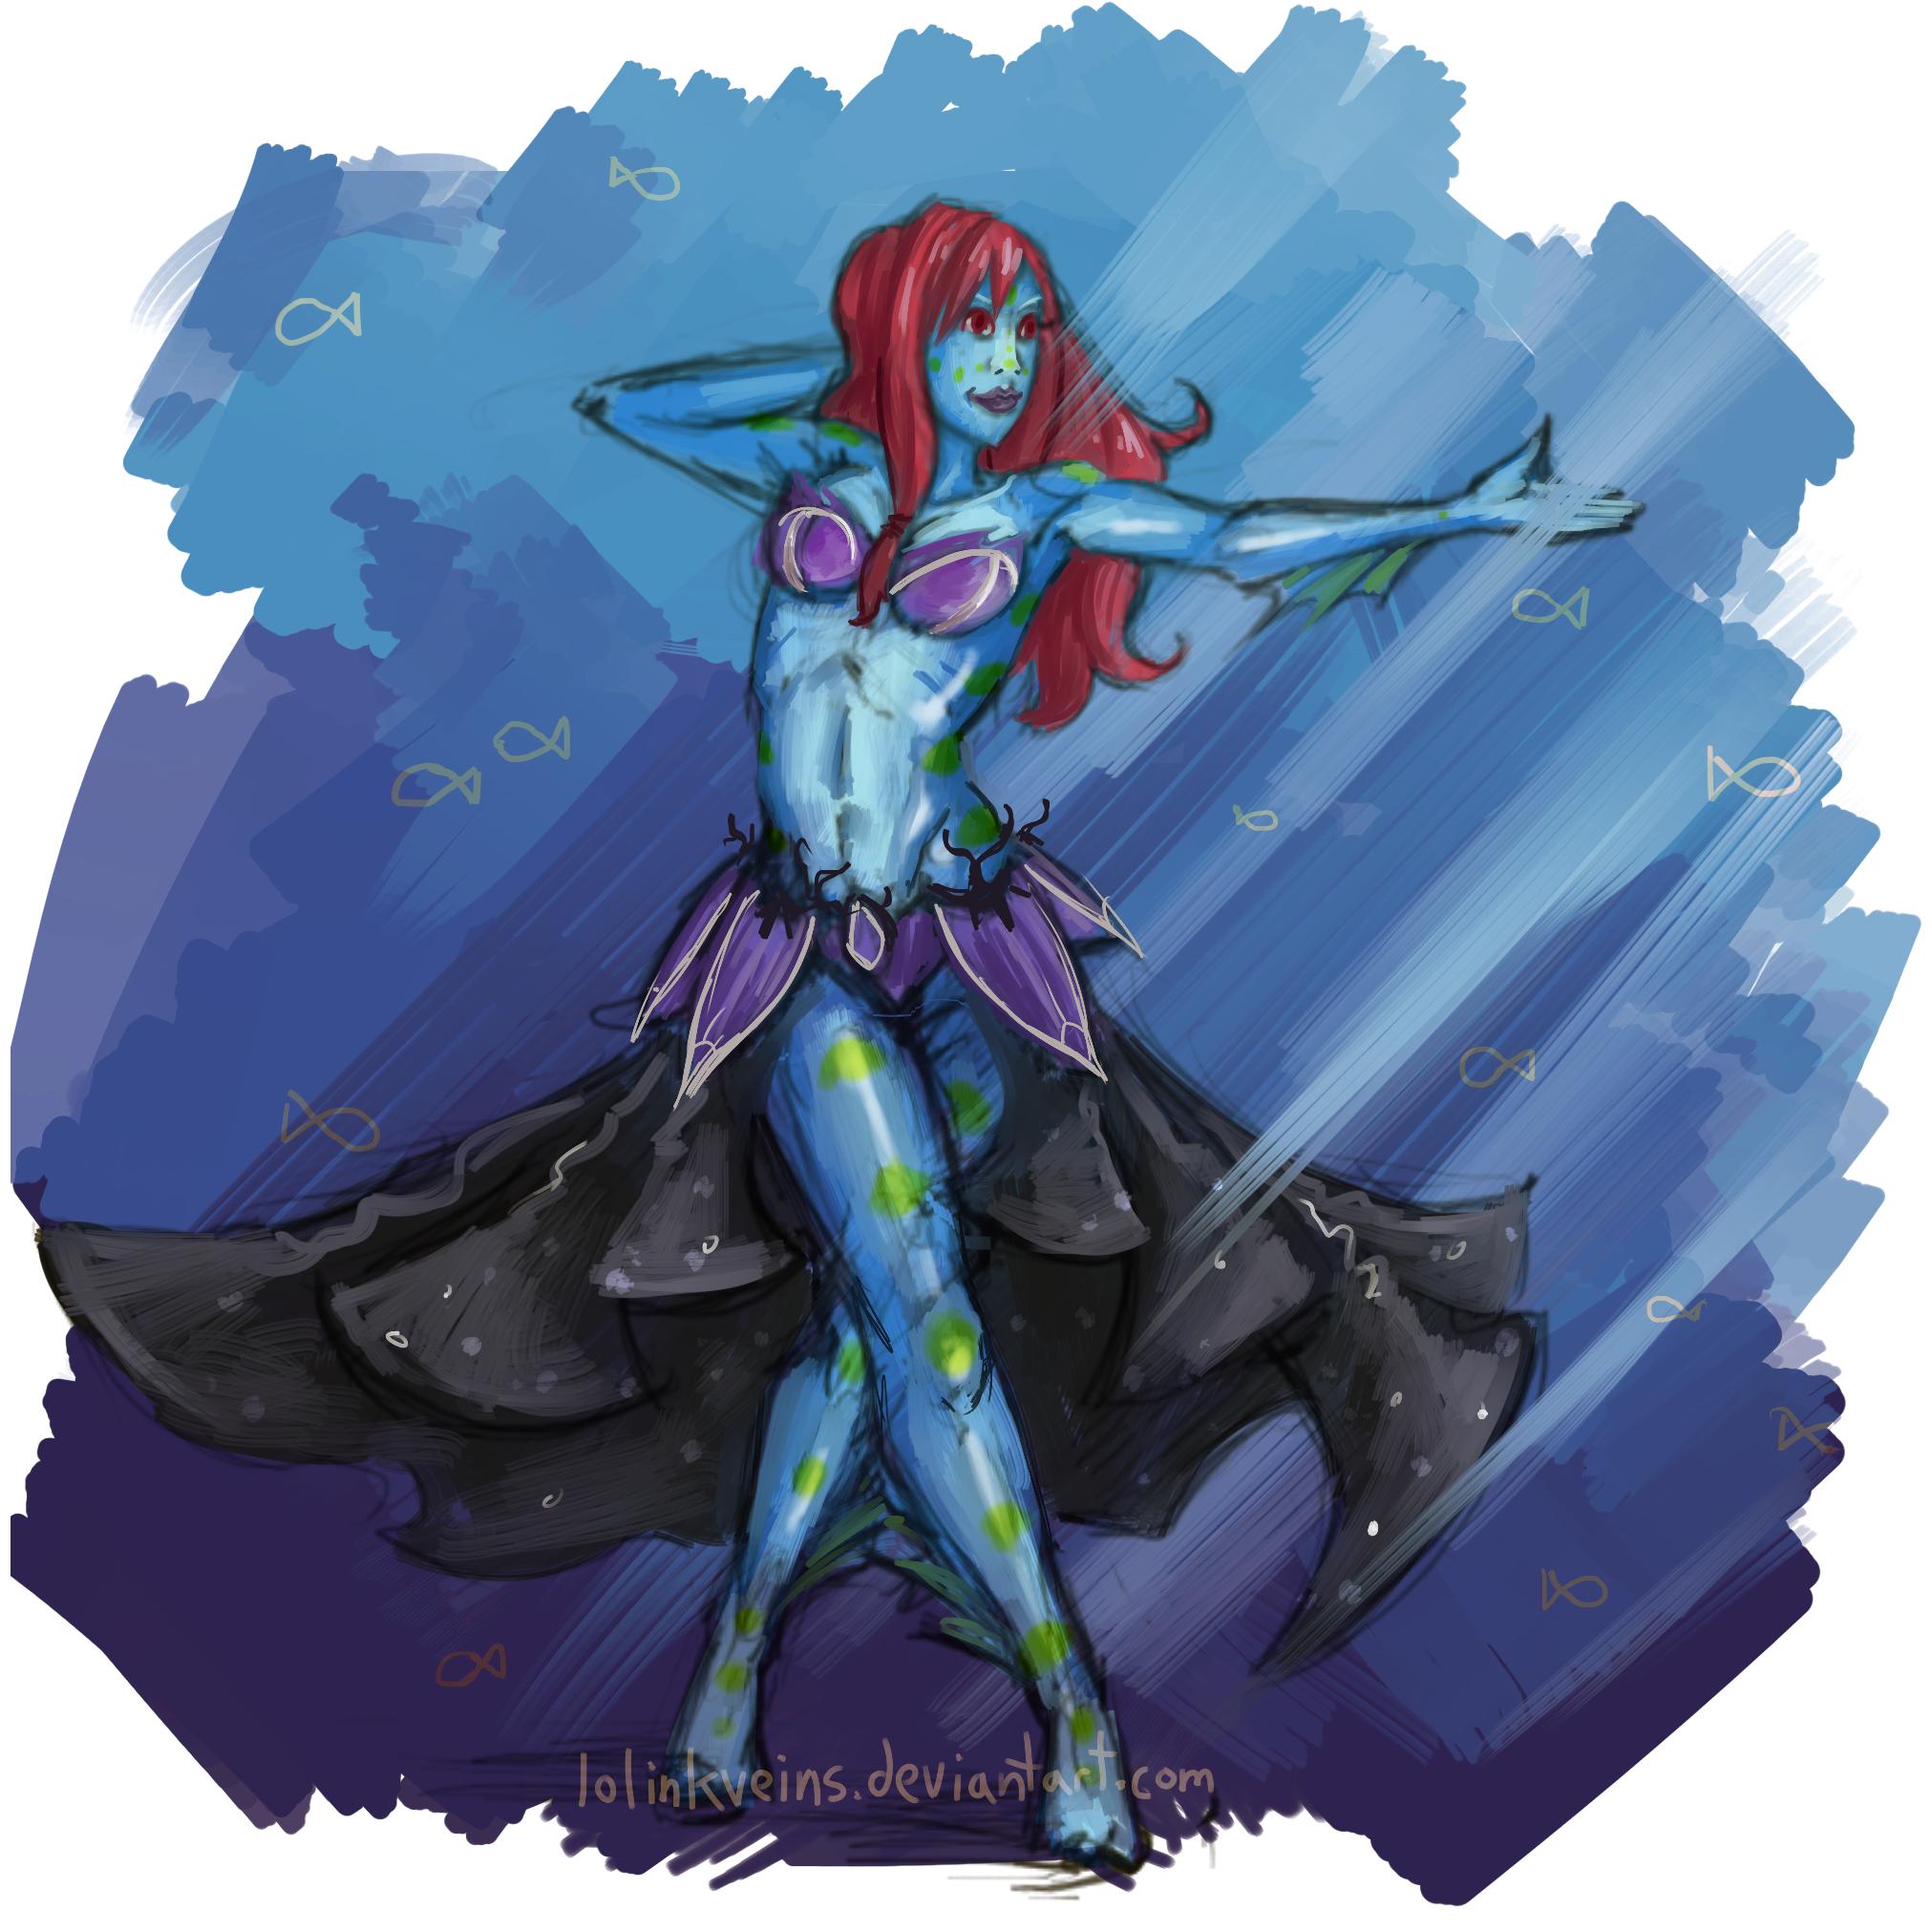 Neato fish lady